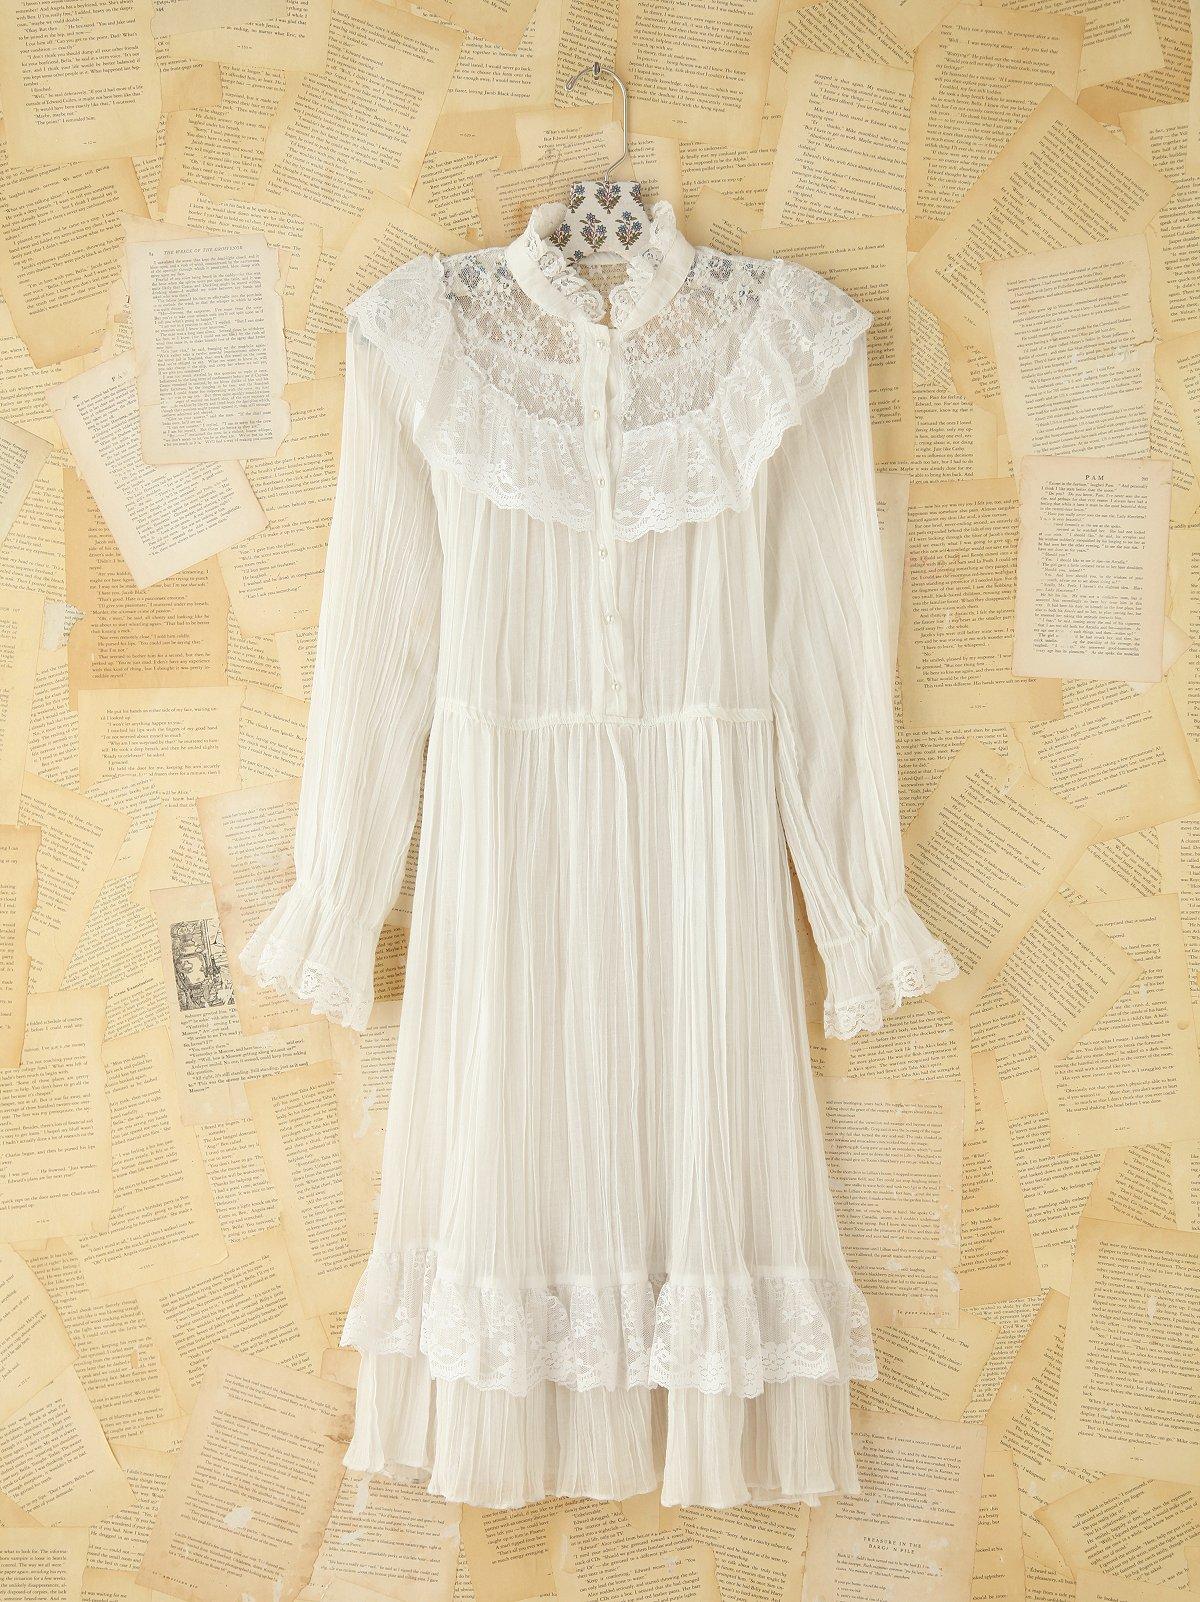 Vintage Lace Trimmed Dress